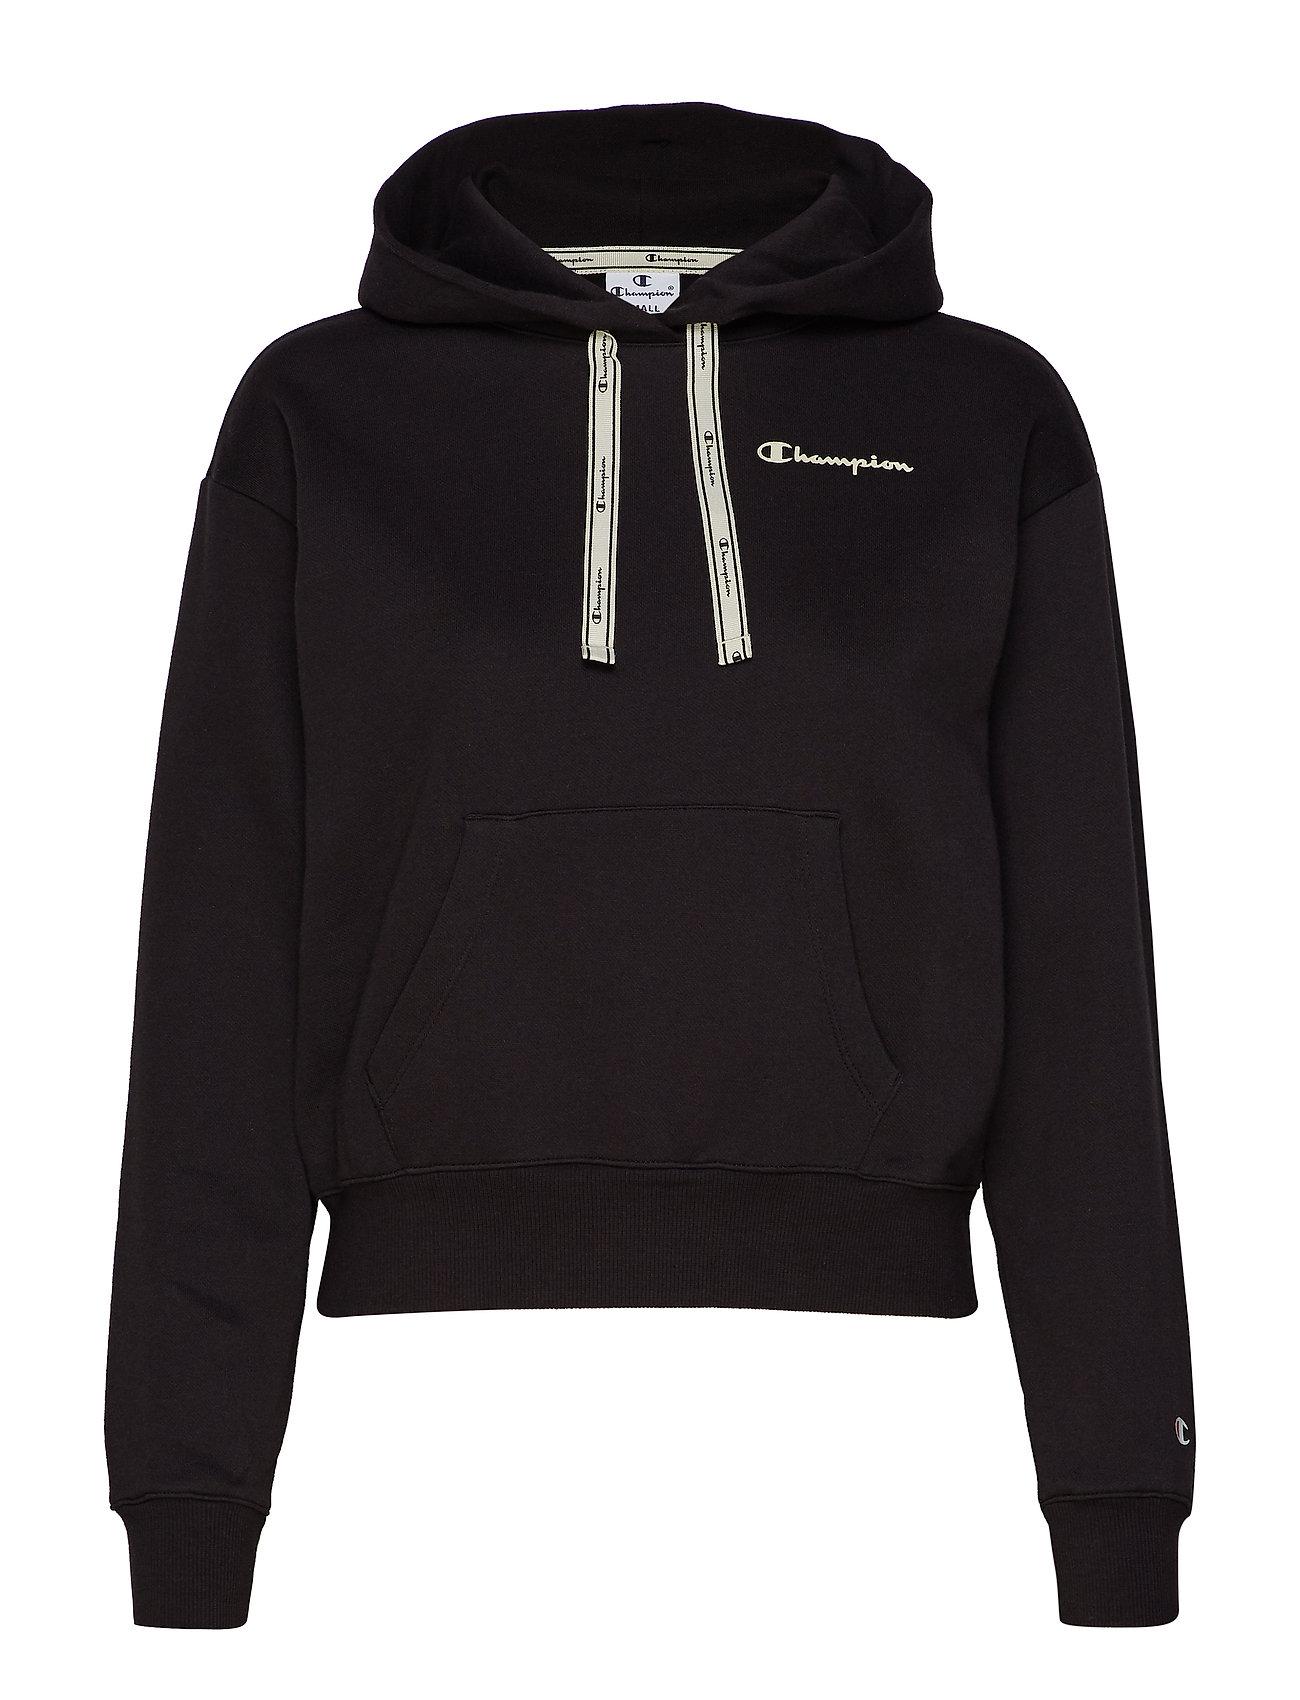 Champion Hooded Crop Top - BLACK BEAUTY